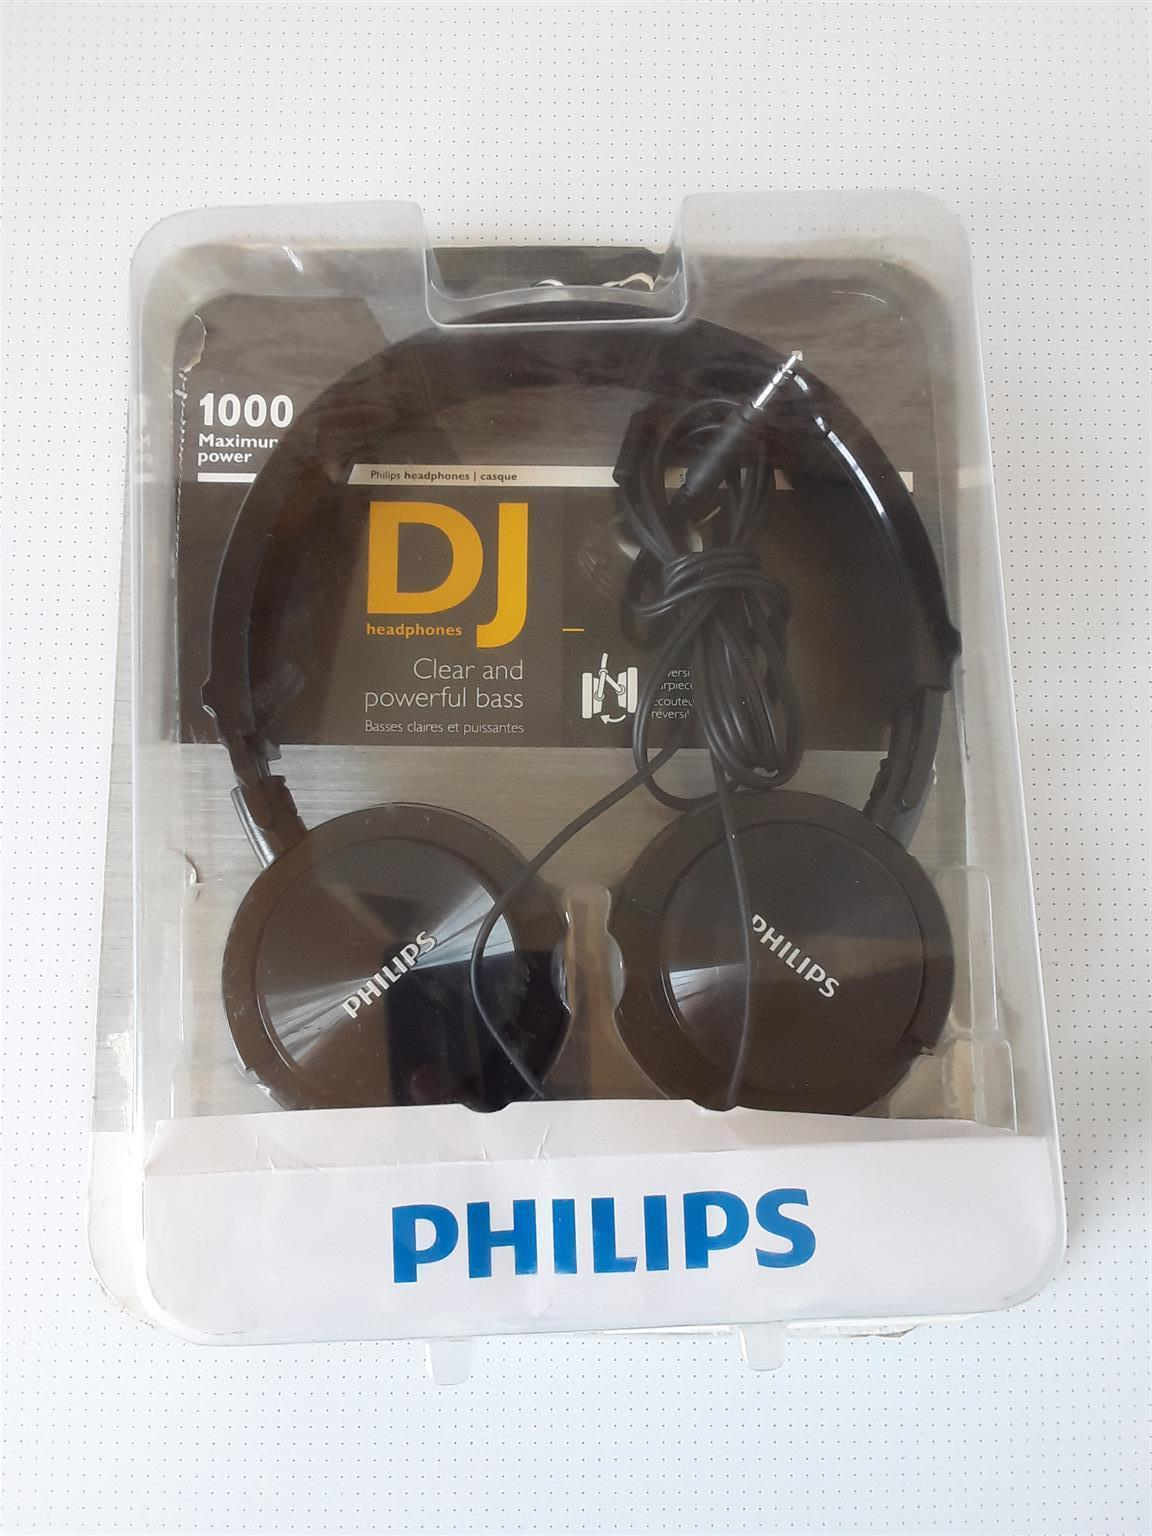 DJ Headphones Phillips Mahimum Power 1000mW. Brand new in a box. I am in Orange Grove.